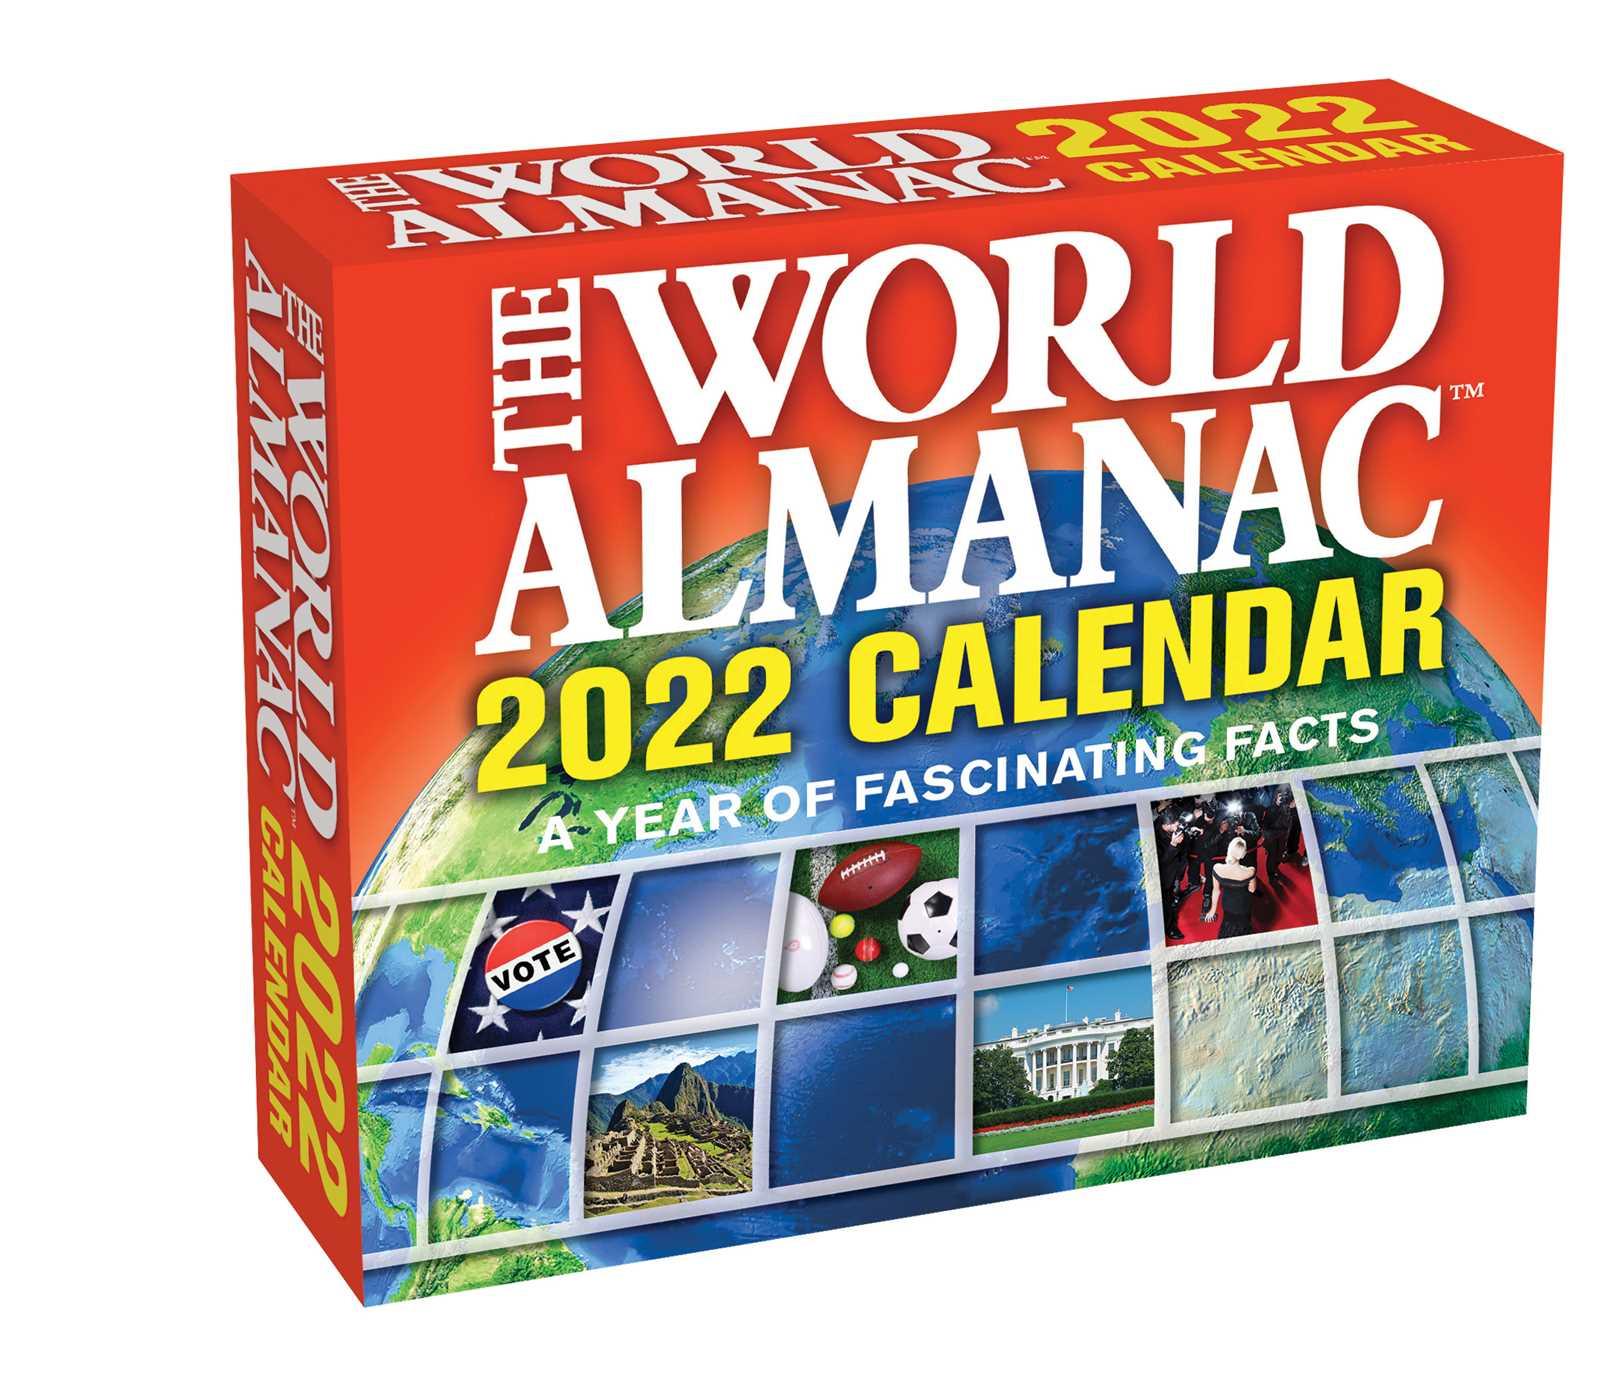 South Carolina 2022 Election Calendar.World Almanac 2022 Day To Day Calendar Book Summary Video Official Publisher Page Simon Schuster